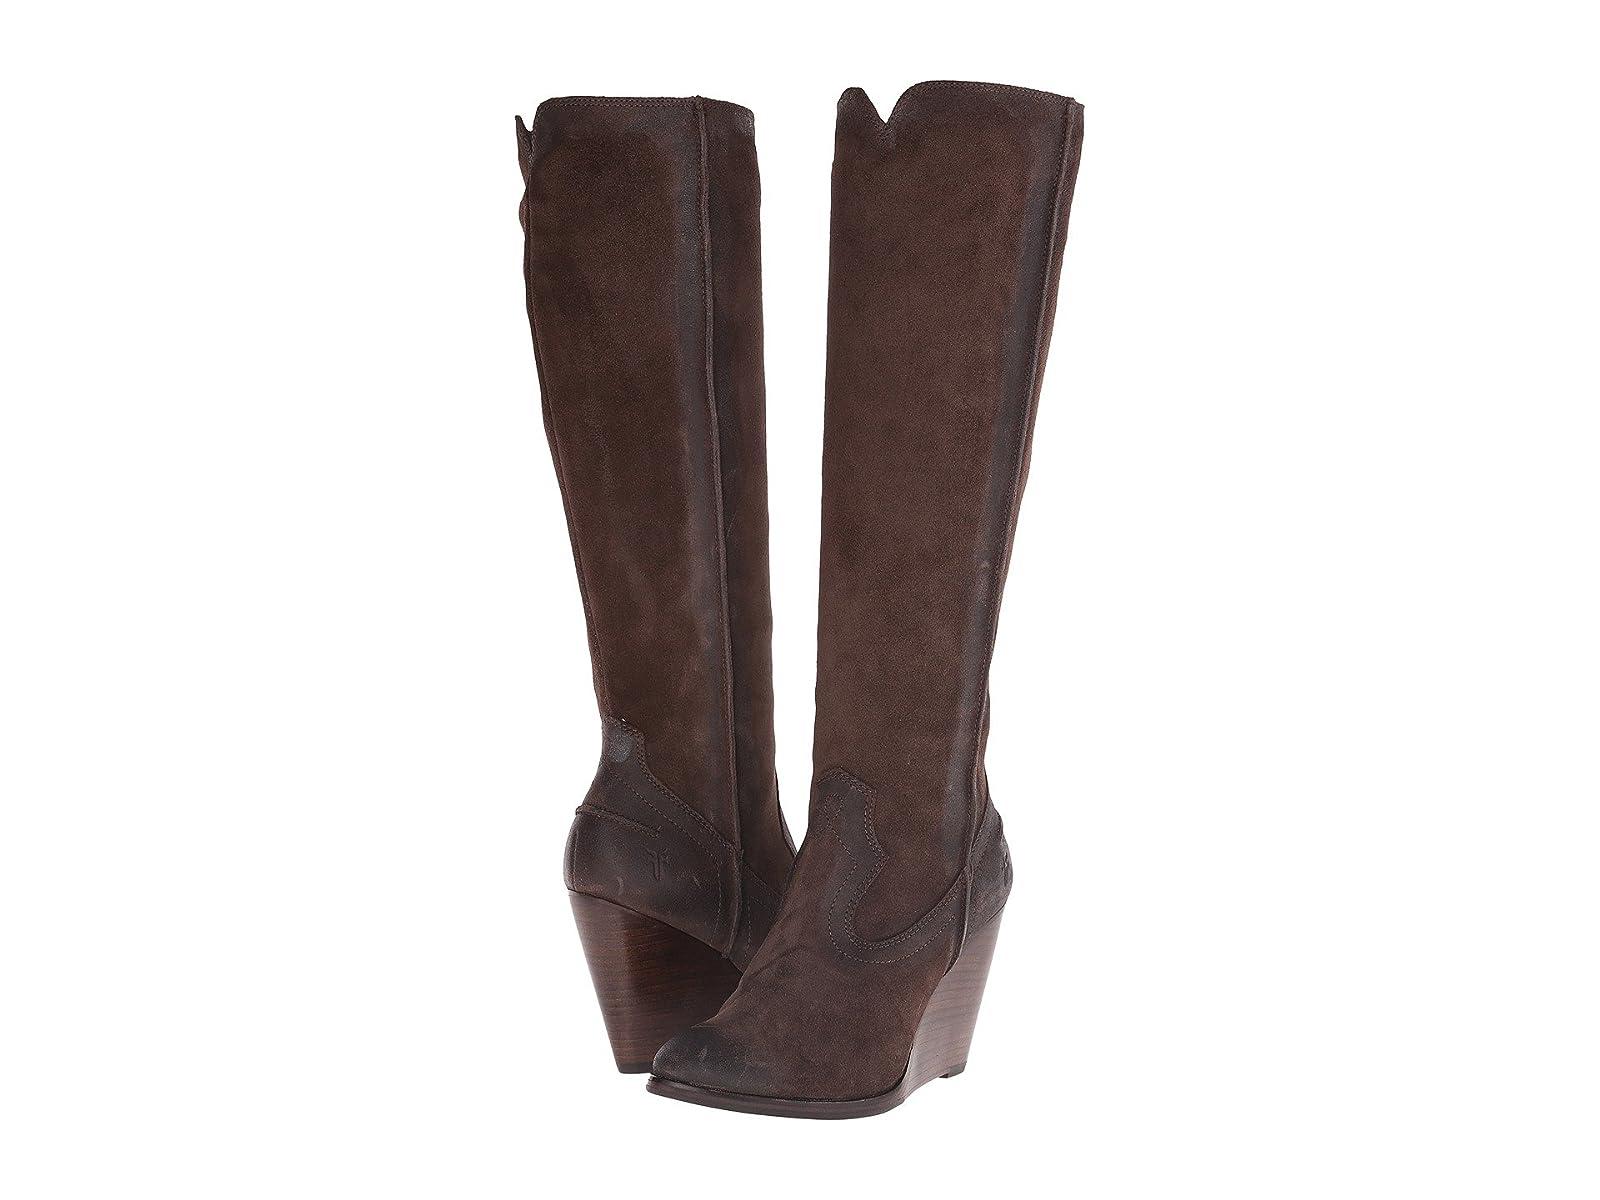 Frye Cece Seam TallCheap and distinctive eye-catching shoes